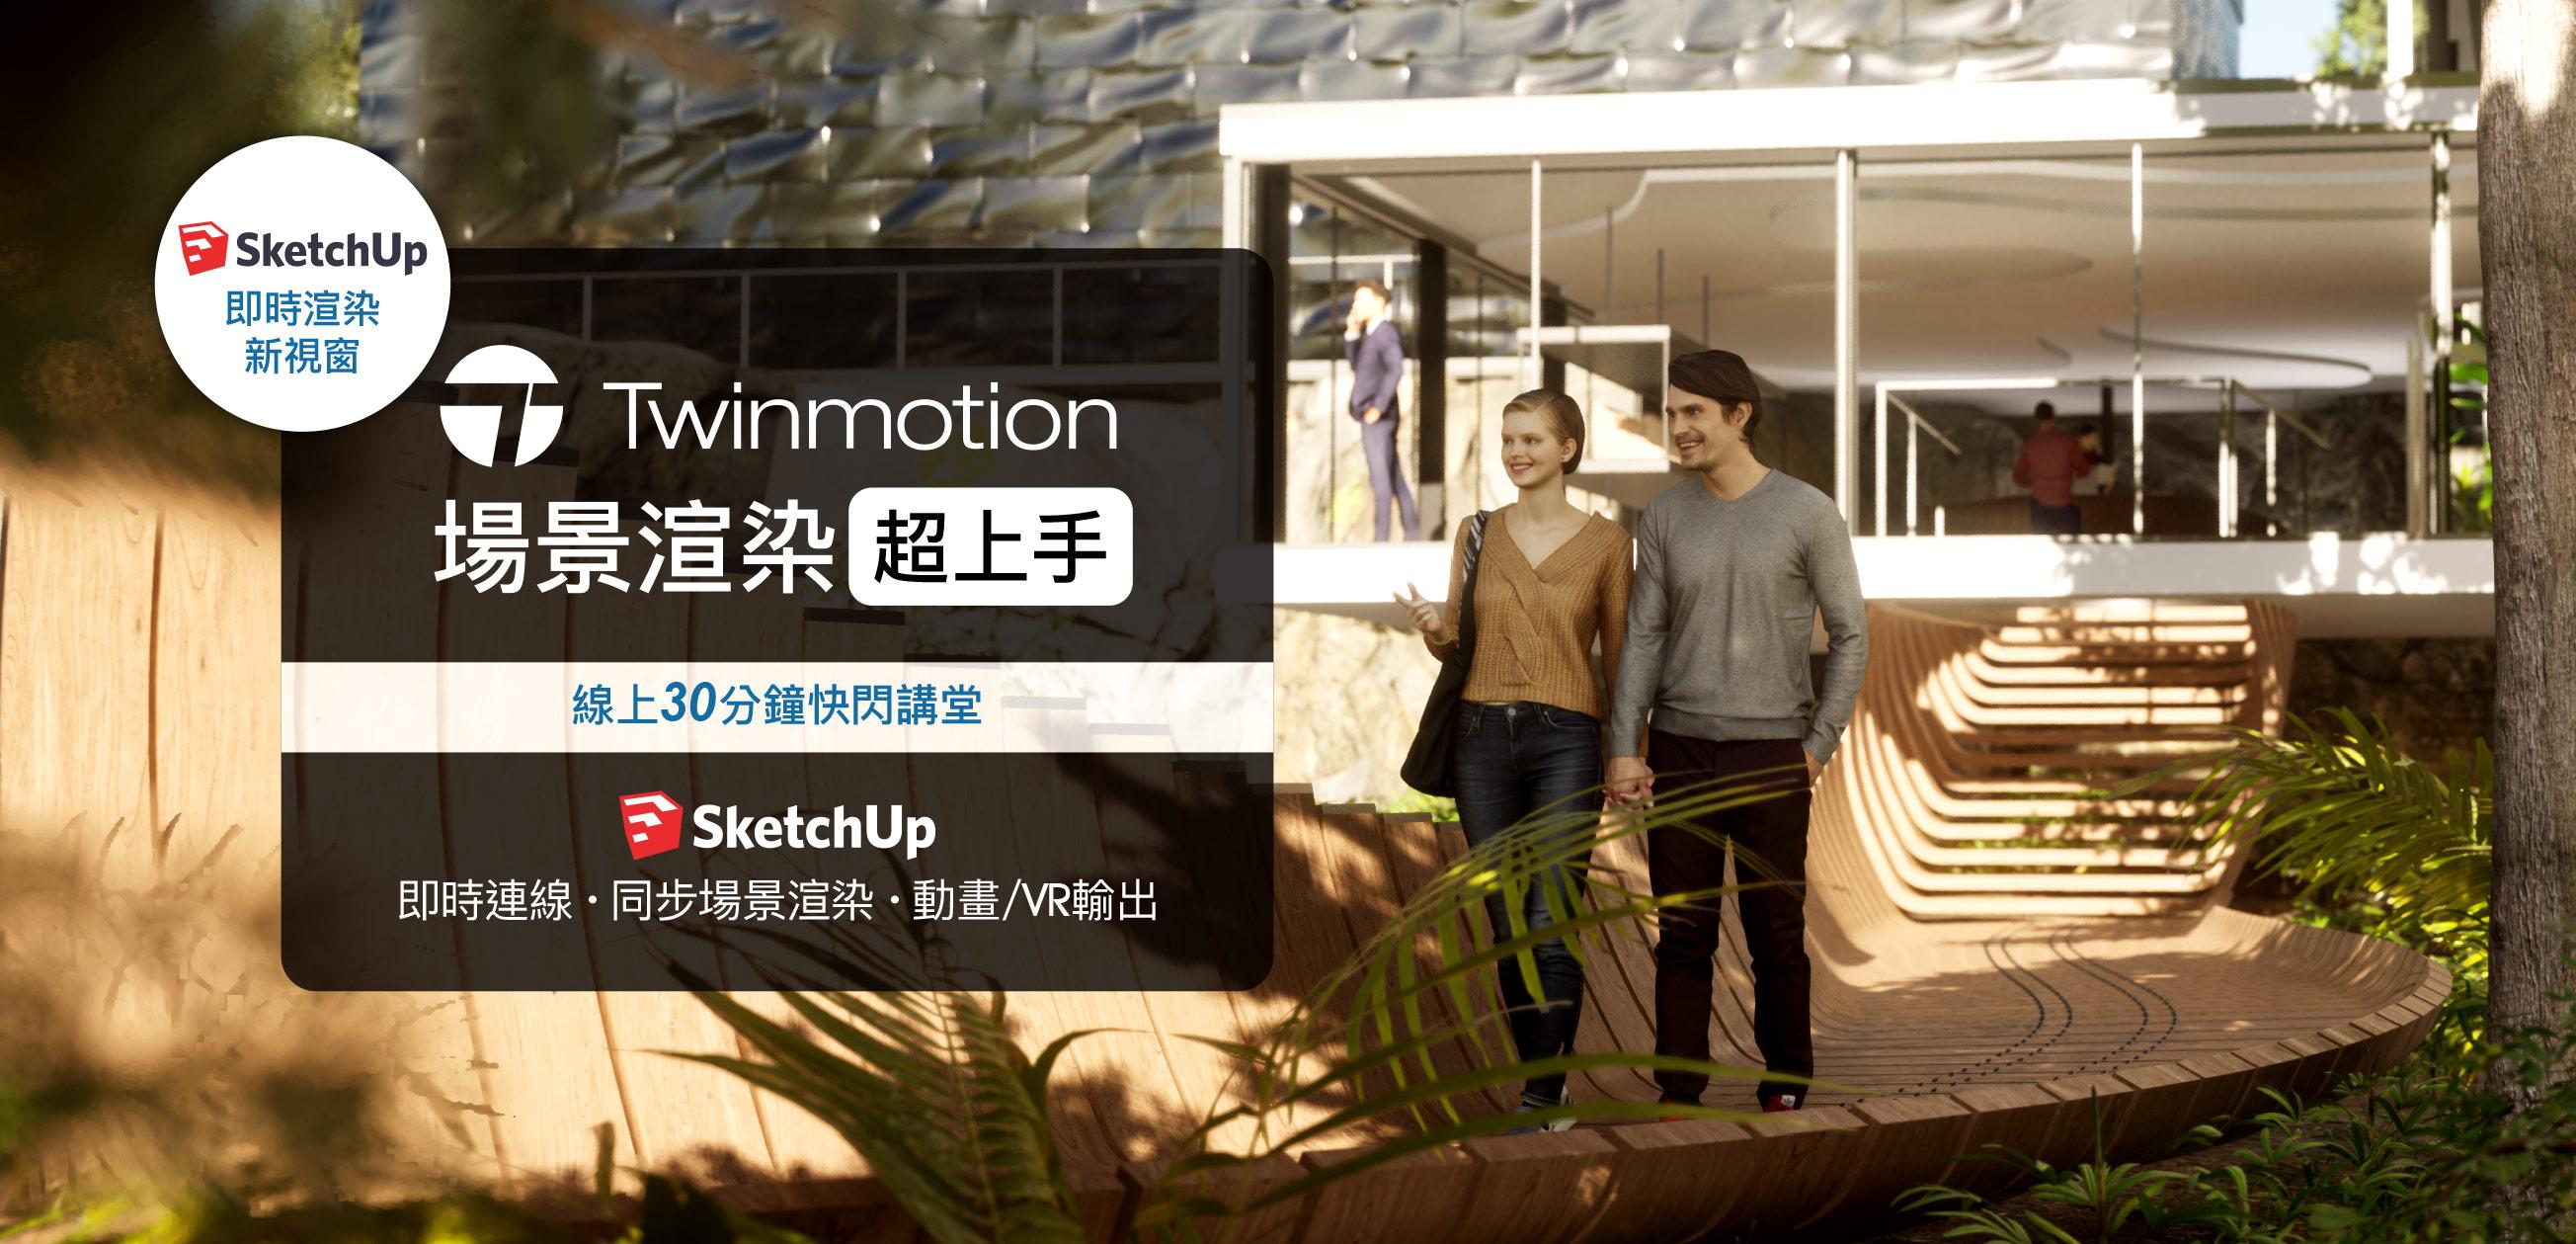 Twinmotion場景渲染 超上手 線上直播活動